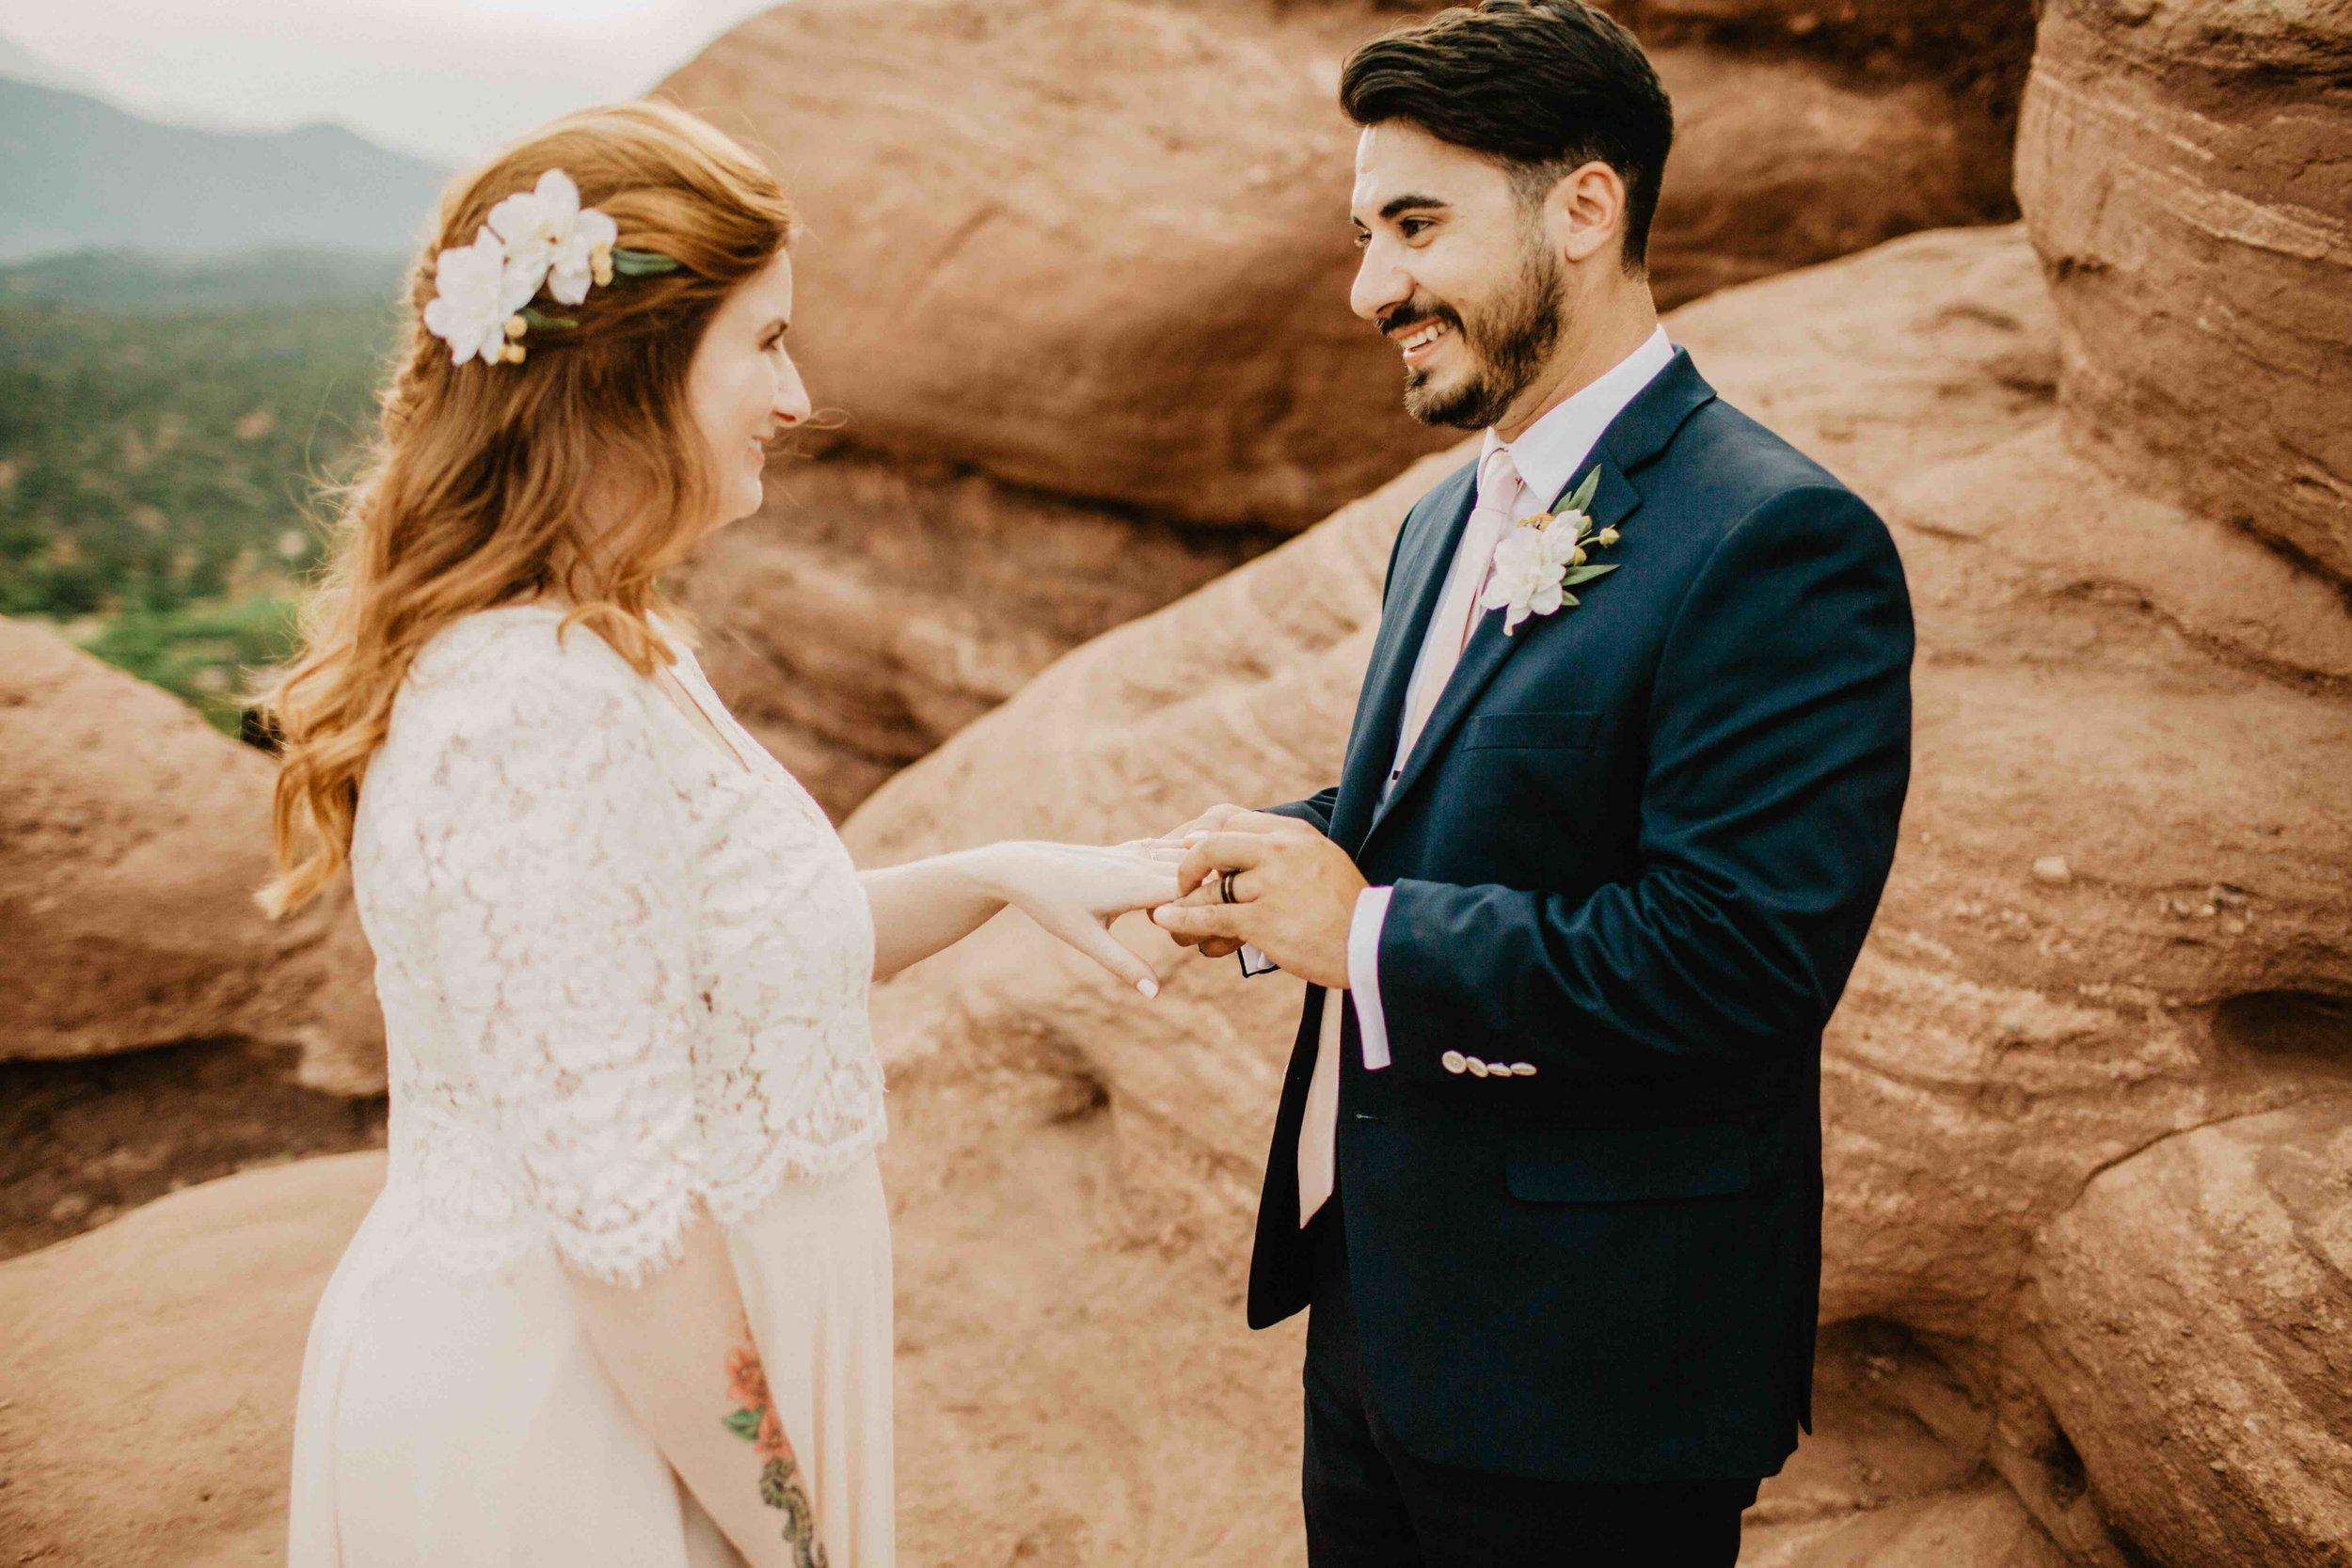 -colorado-wedding-photographer-denver-springs-vail-607A3884.jpeg